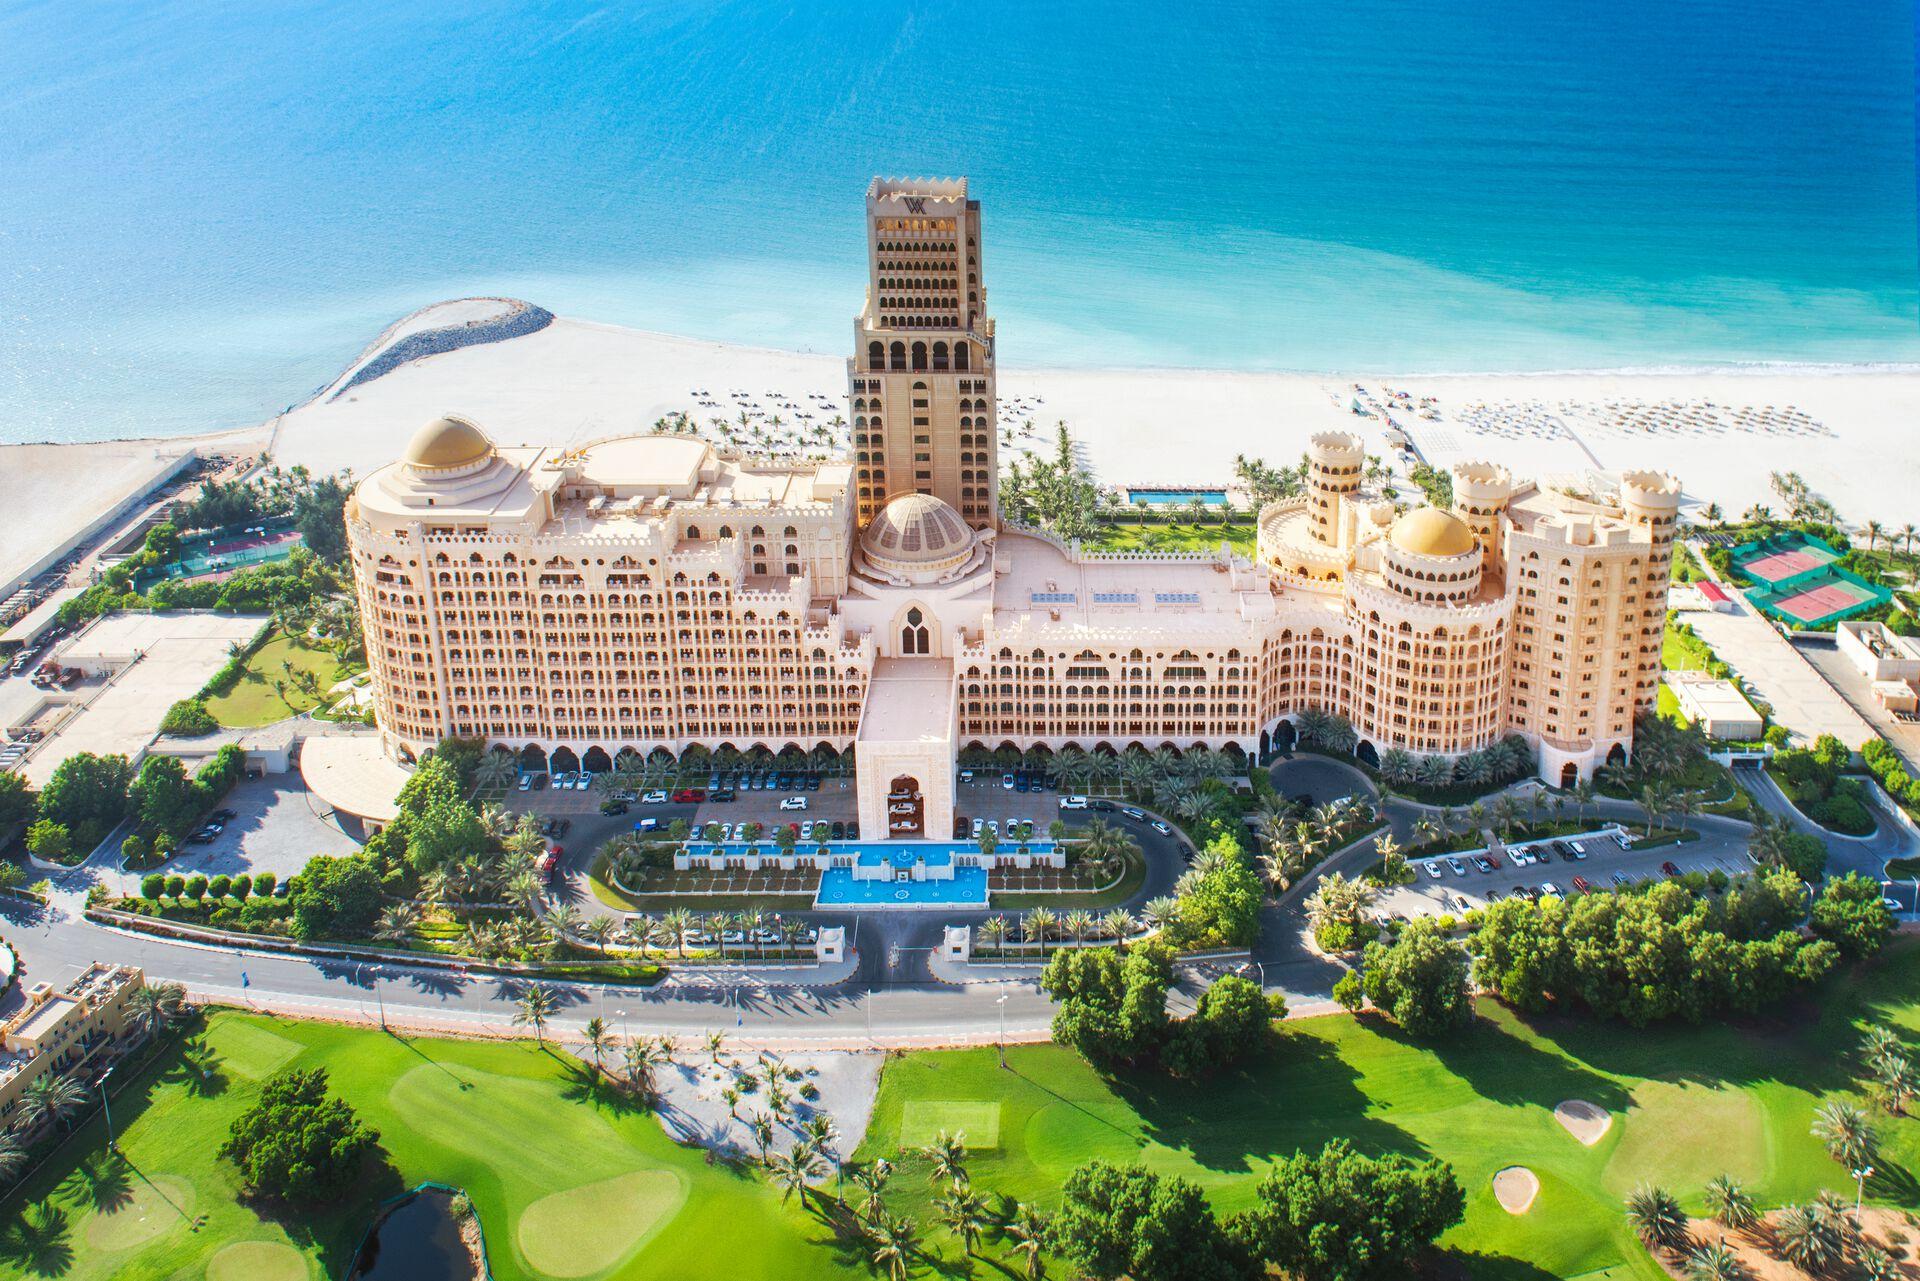 Séjour Ras Al Khaimah - Waldorf Astoria Ras Al Khaimah - 5*